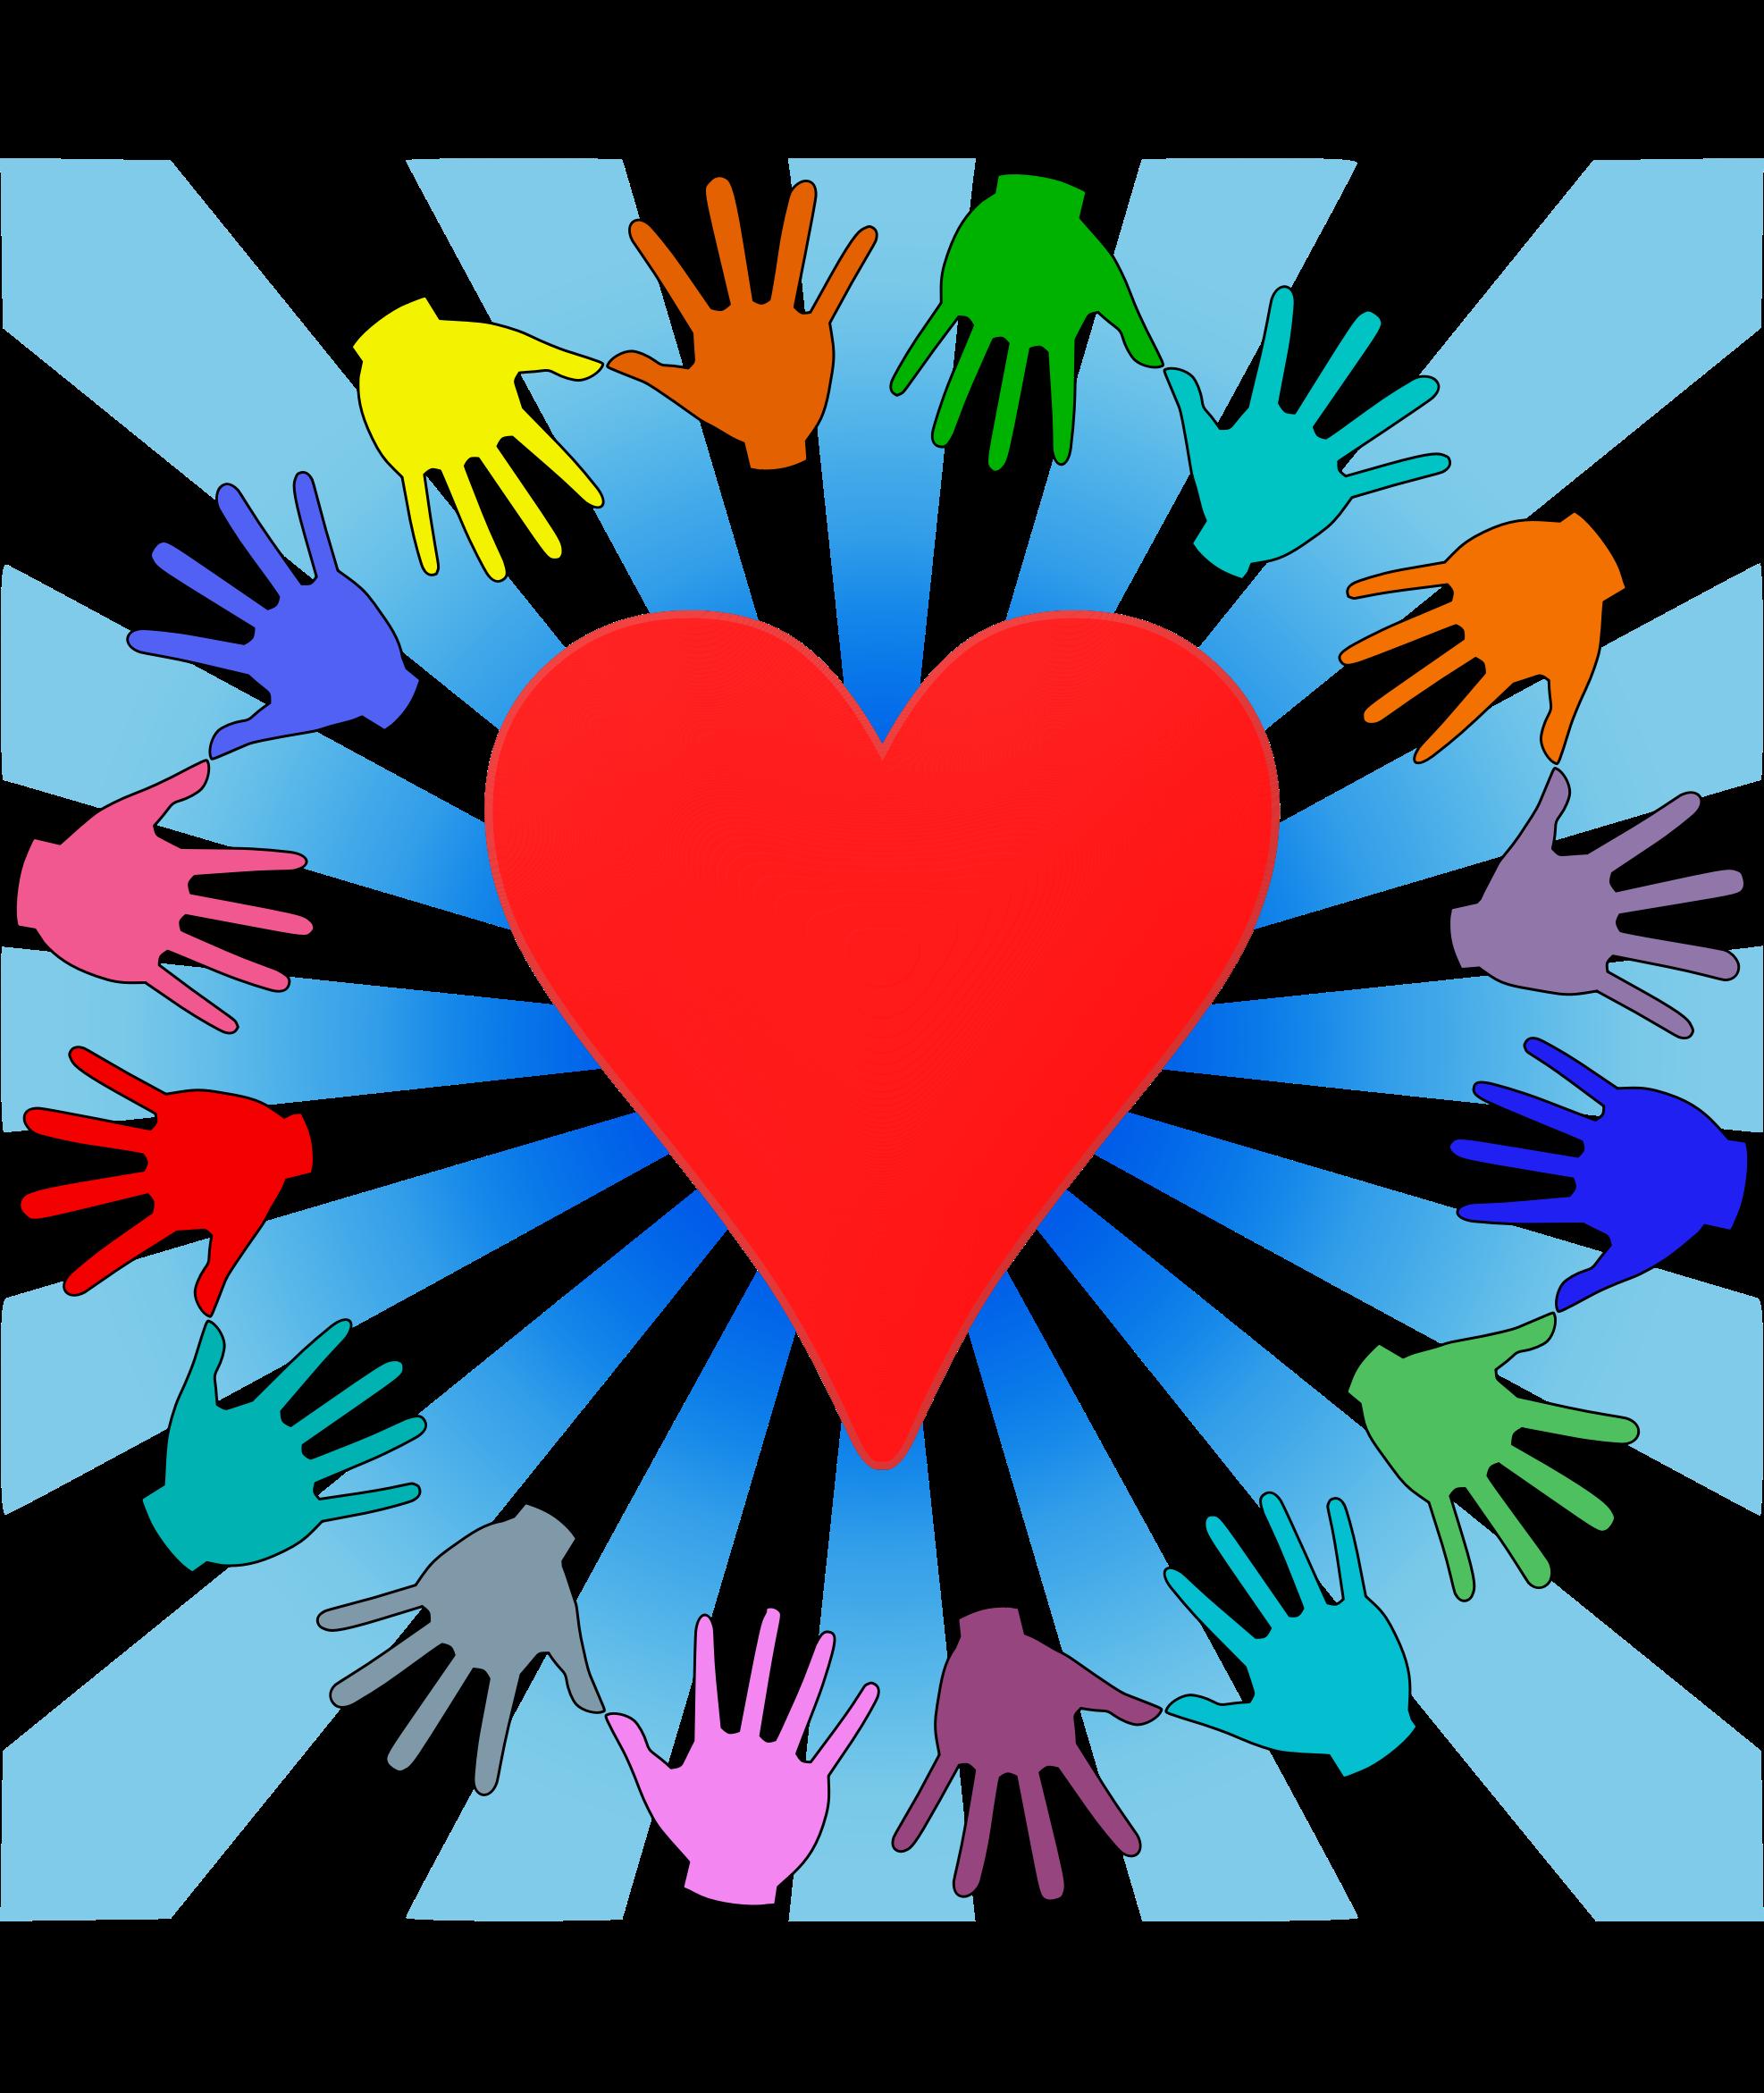 Kind volunteers big image. Volunteering clipart music